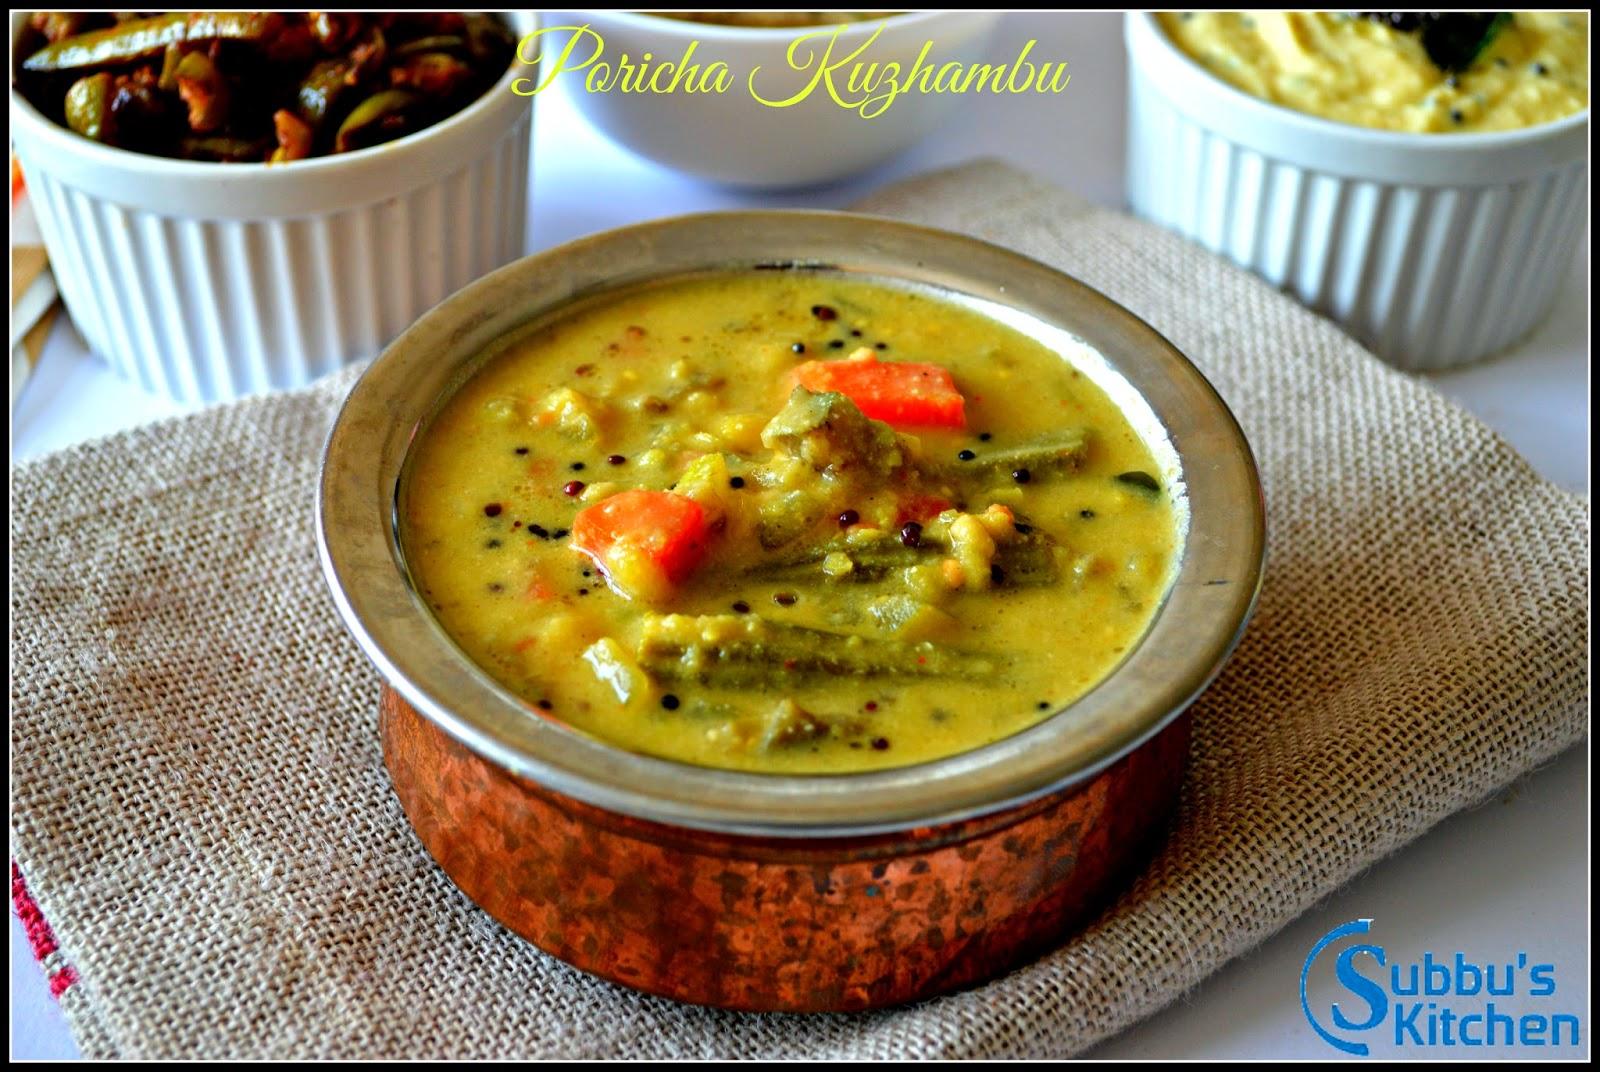 Poritha Kuzhambu / Poricha Kuzhambu